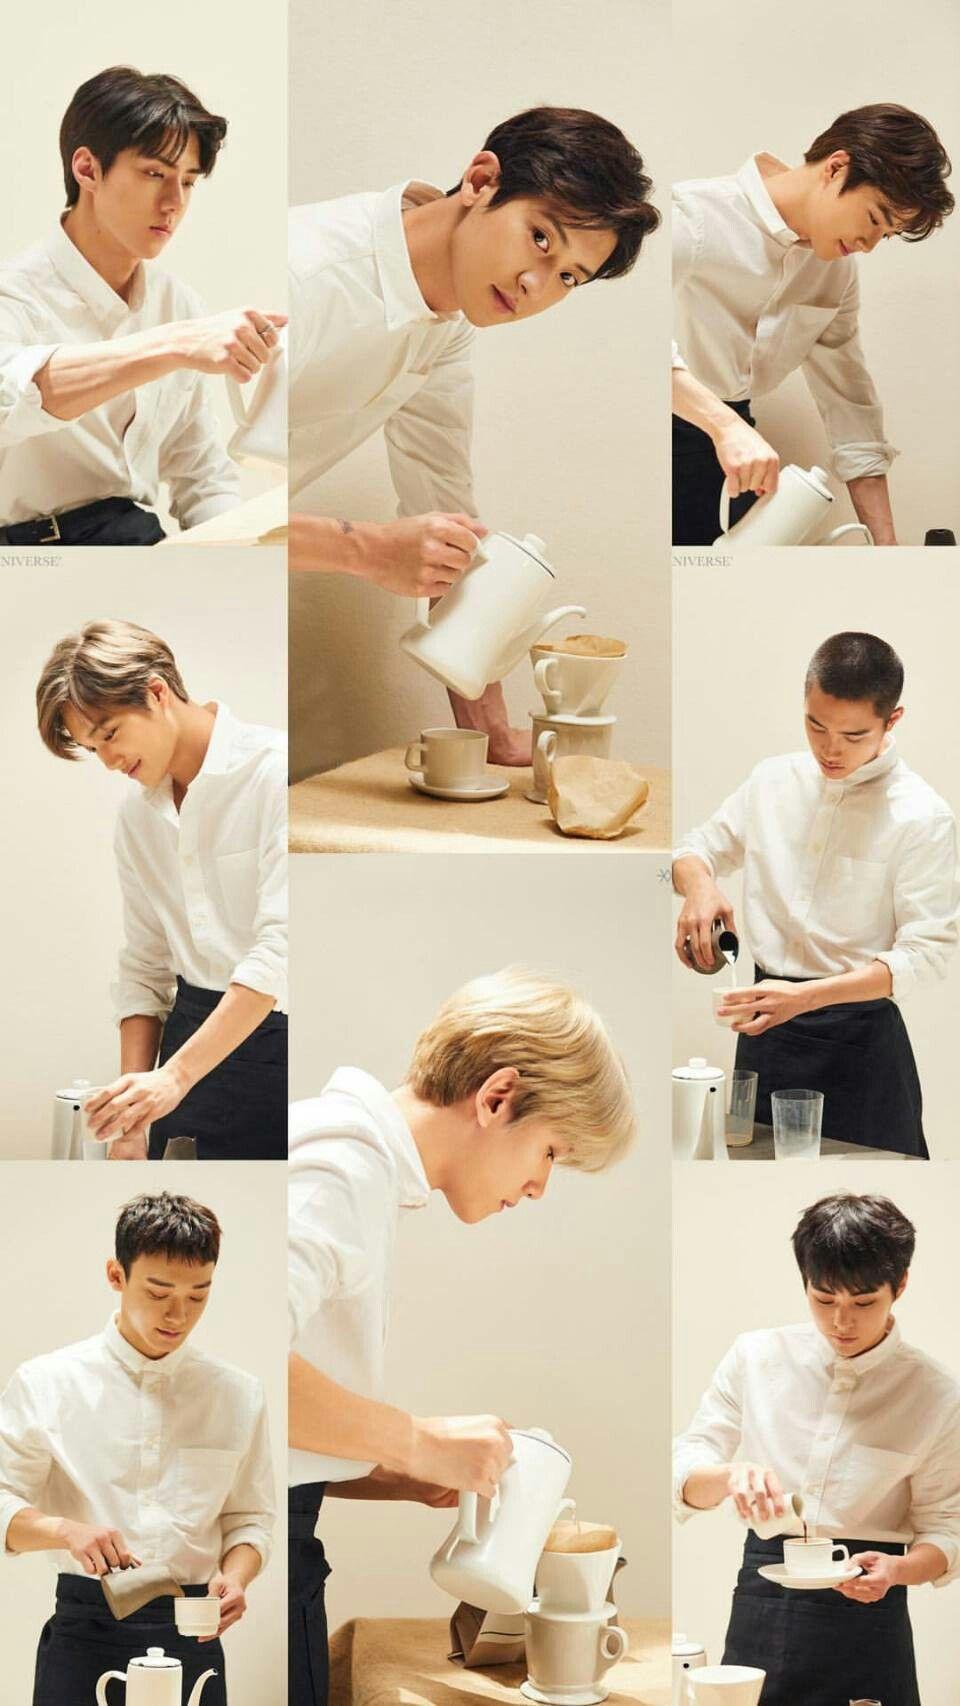 Exo Universe Kpop In 2019 Pinterest Exo Exo Kokobop And Exo